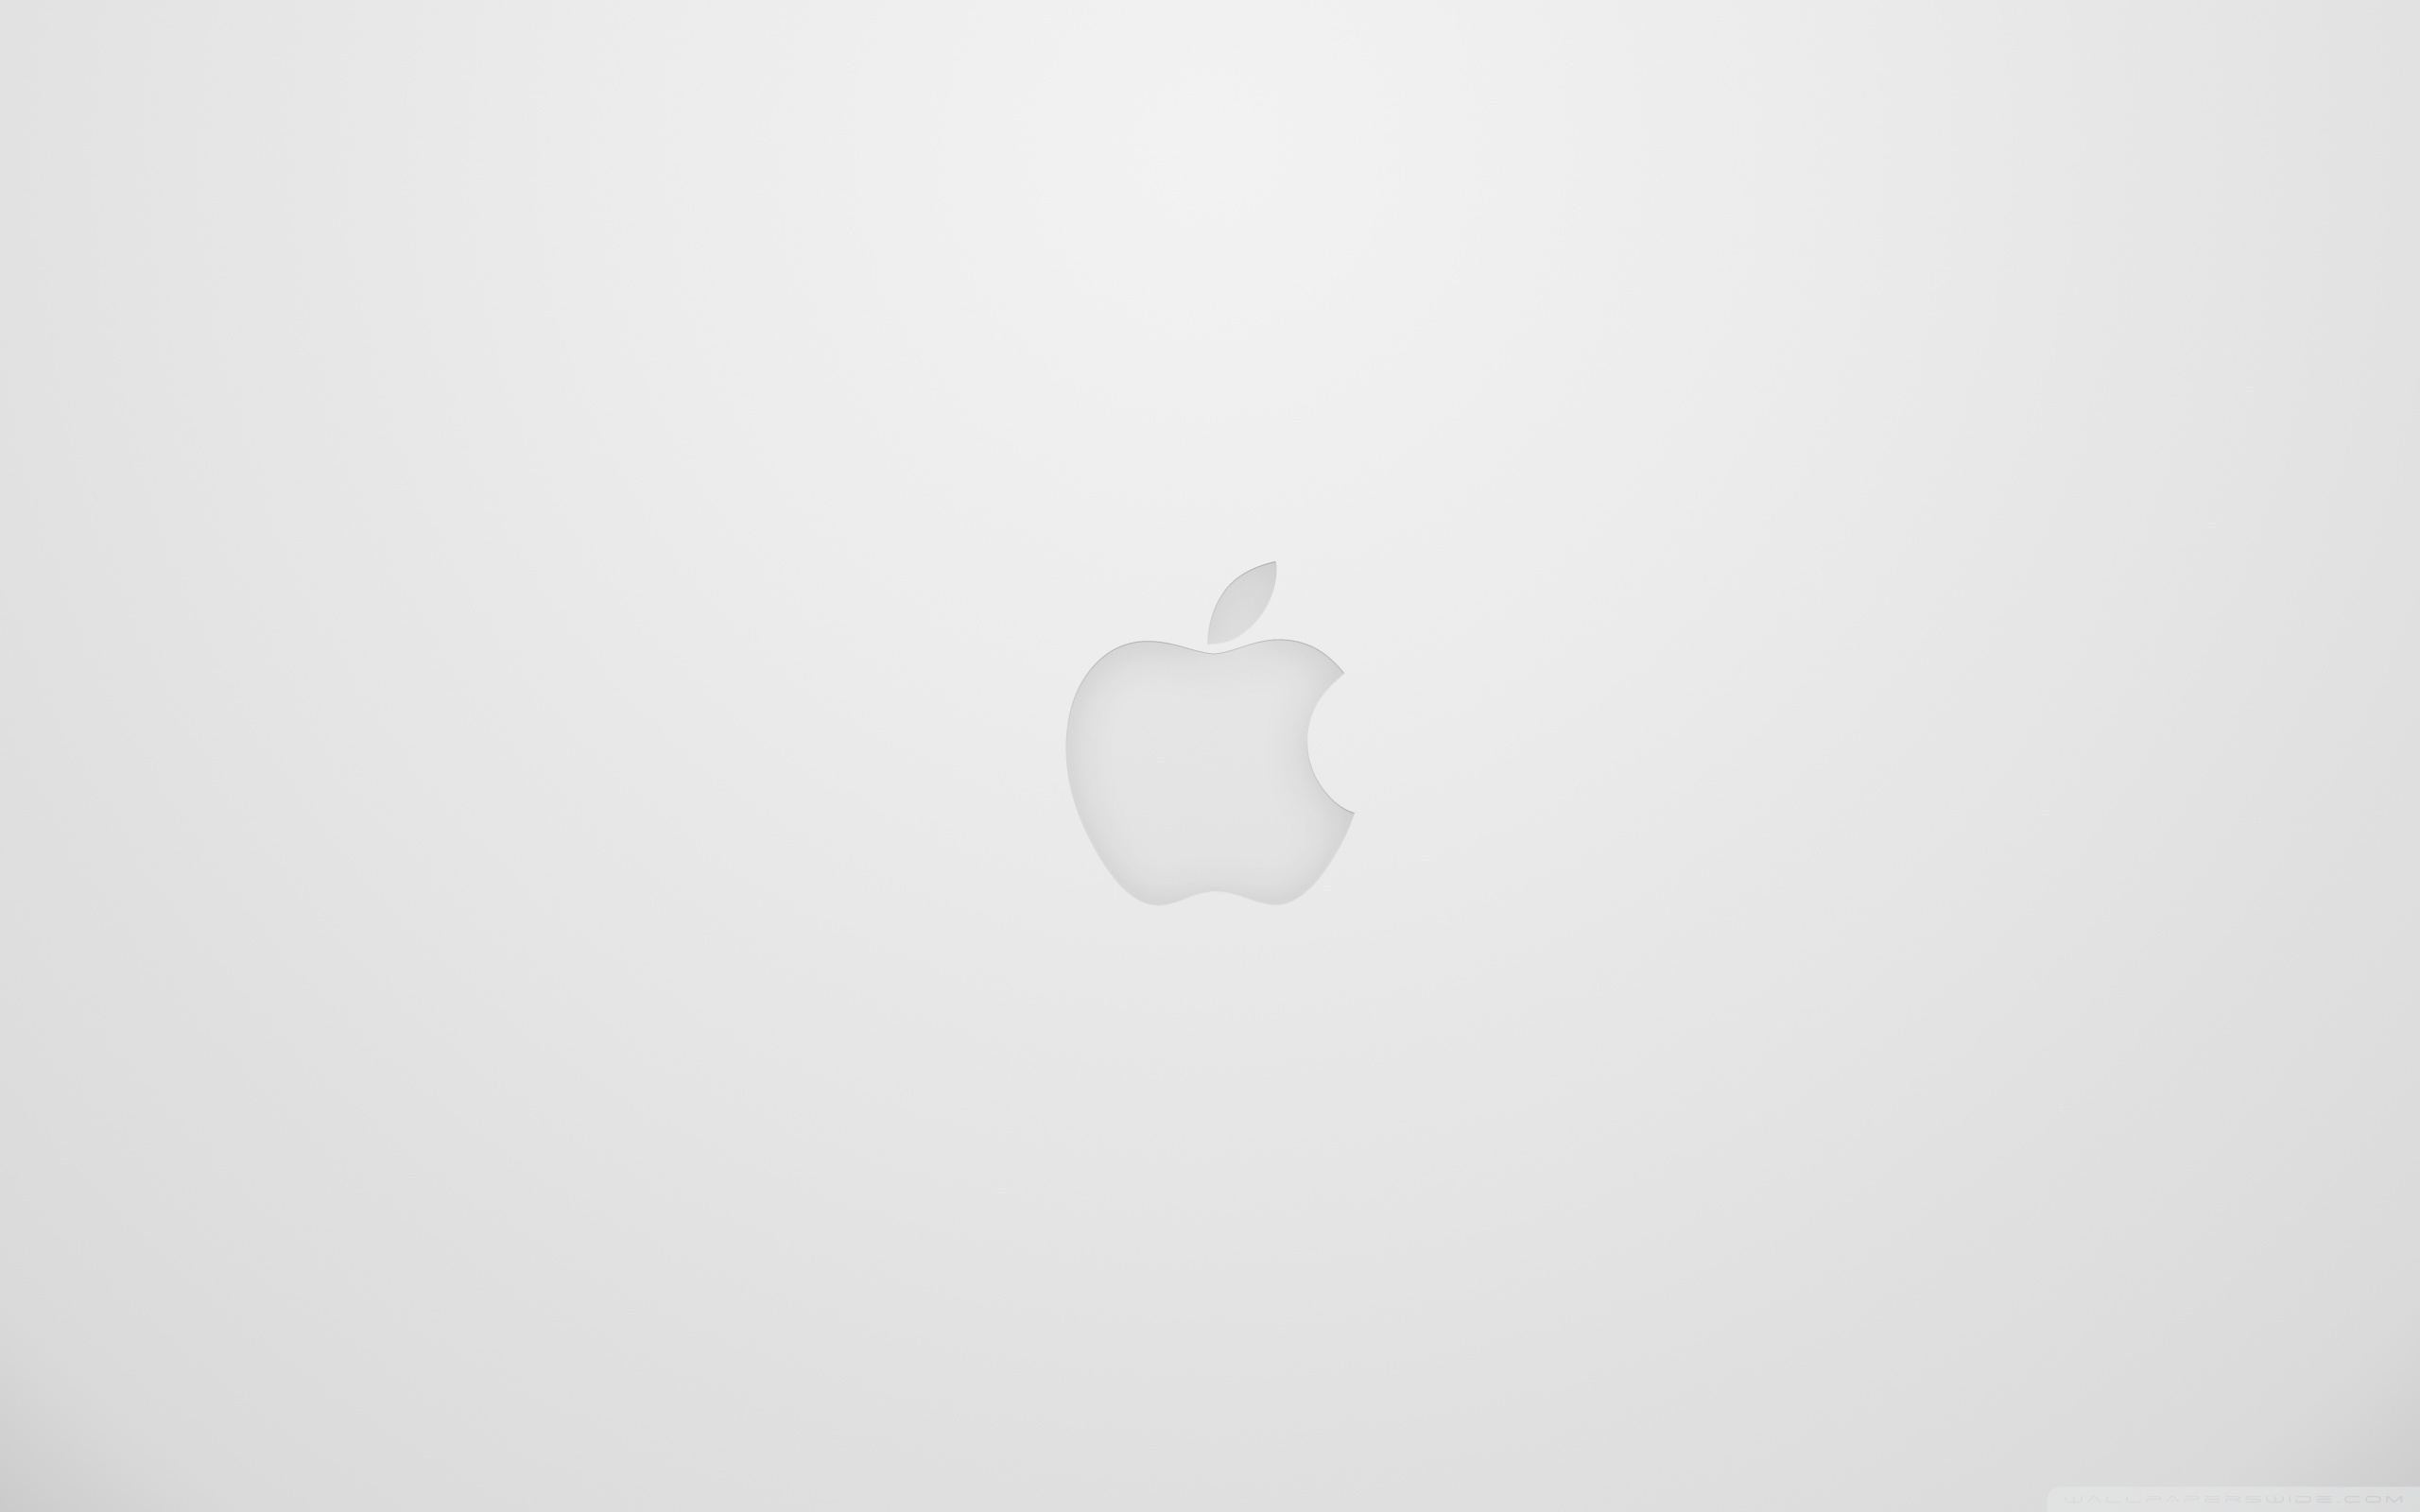 3d Silver Grey Wallpaper Apple Logo White 4k Hd Desktop Wallpaper For 4k Ultra Hd